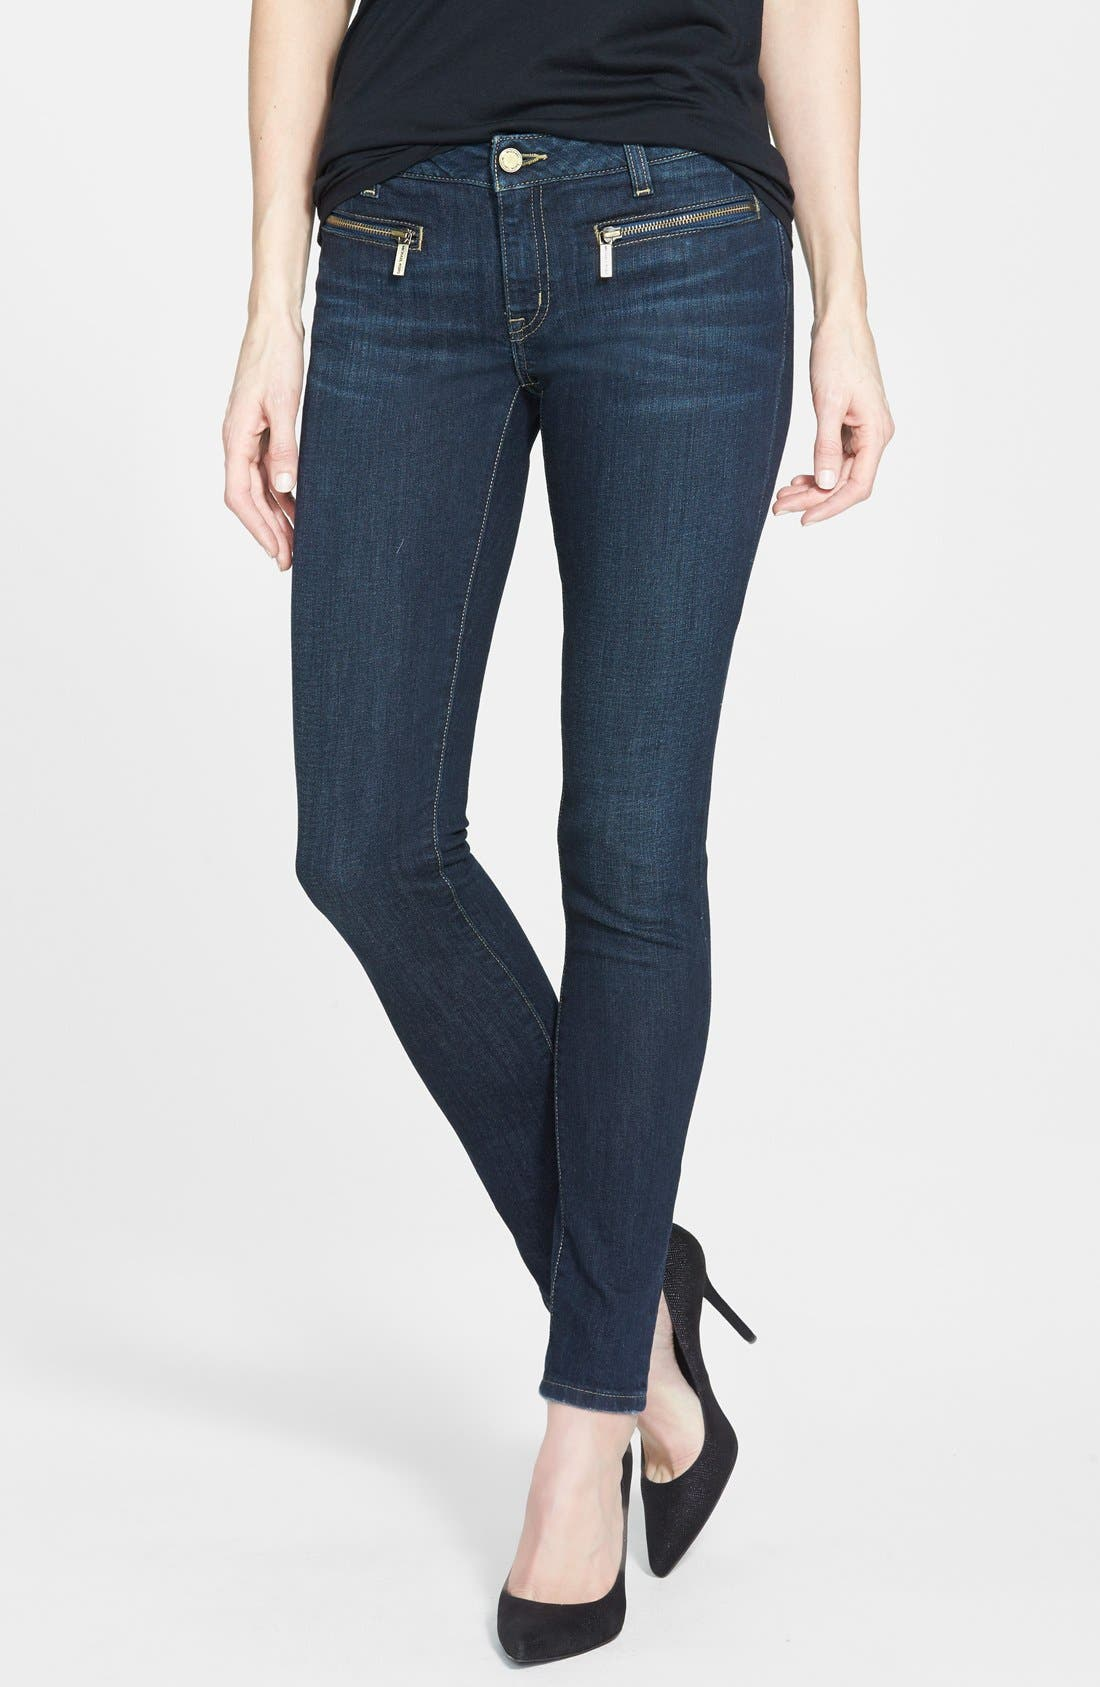 Alternate Image 1 Selected - MICHAEL Michael Kors Zip Pocket Skinny Jeans (Veruschka) (Petite)